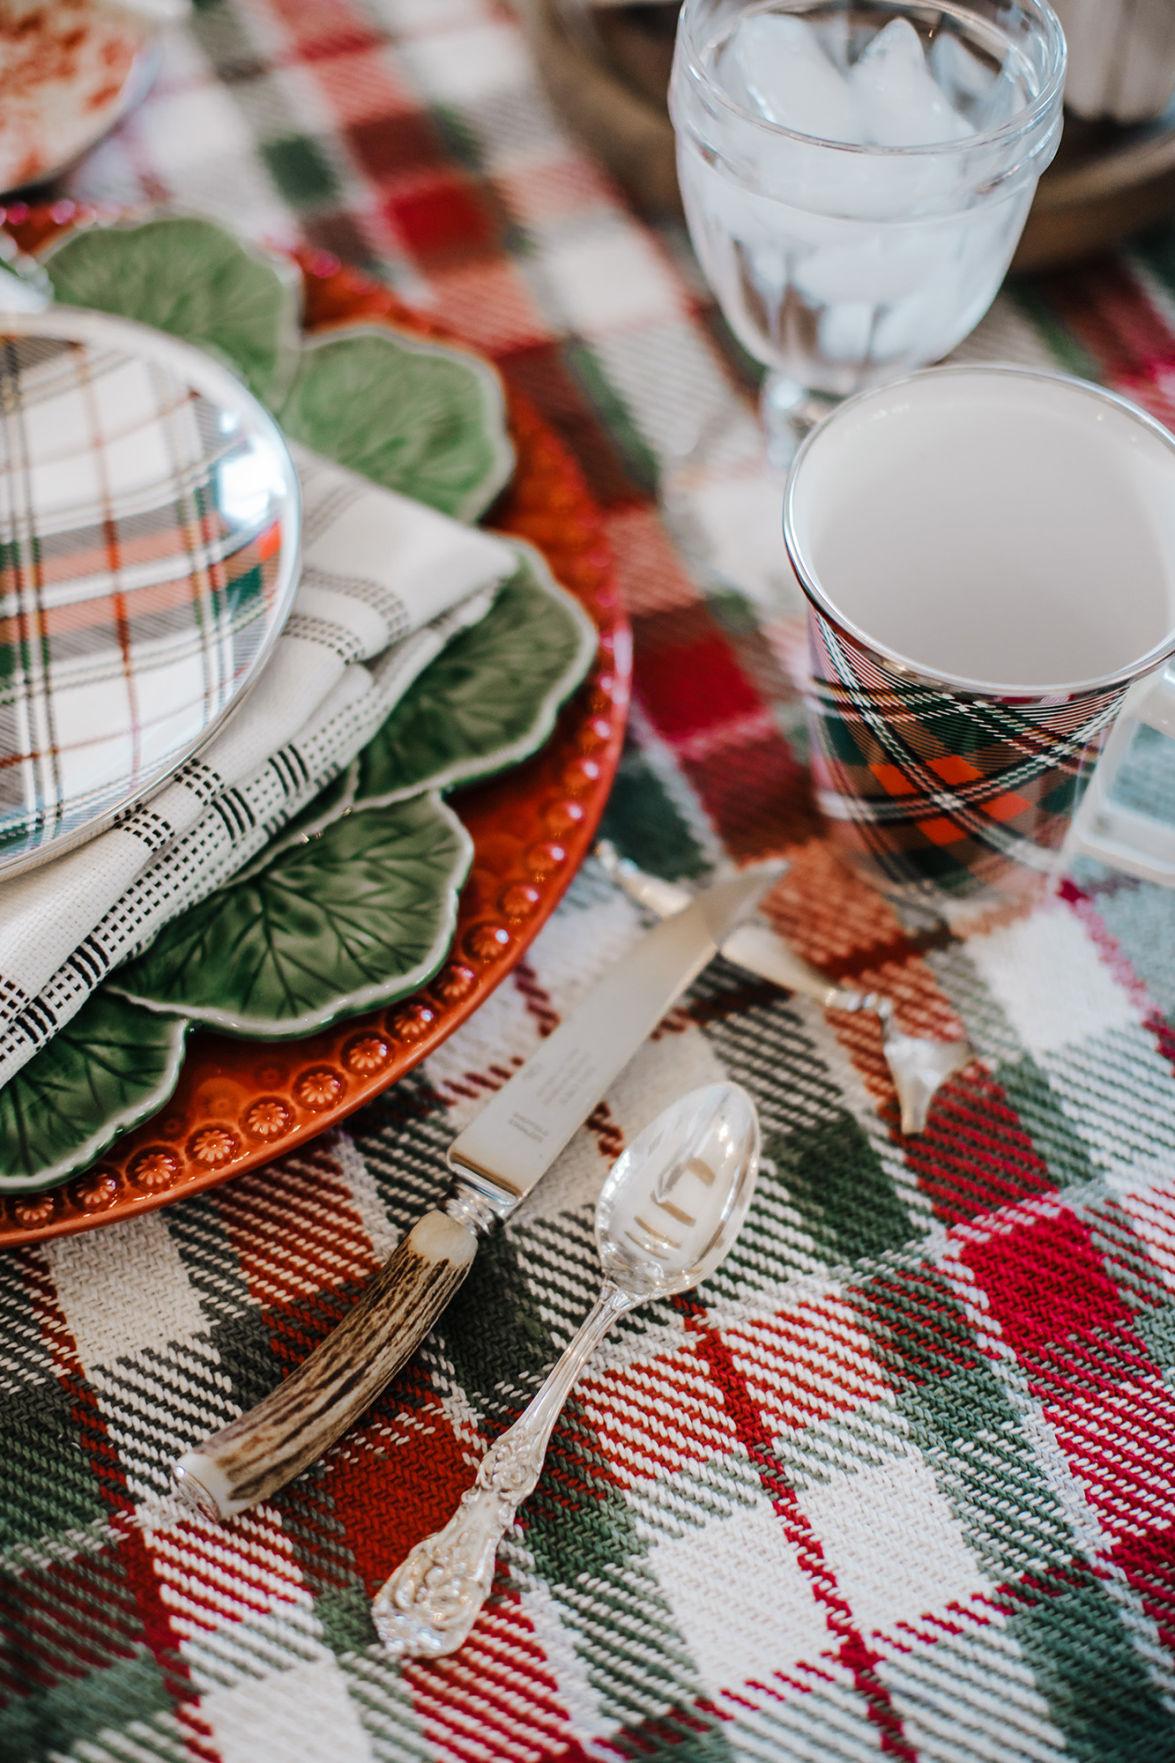 Mix and match textiles